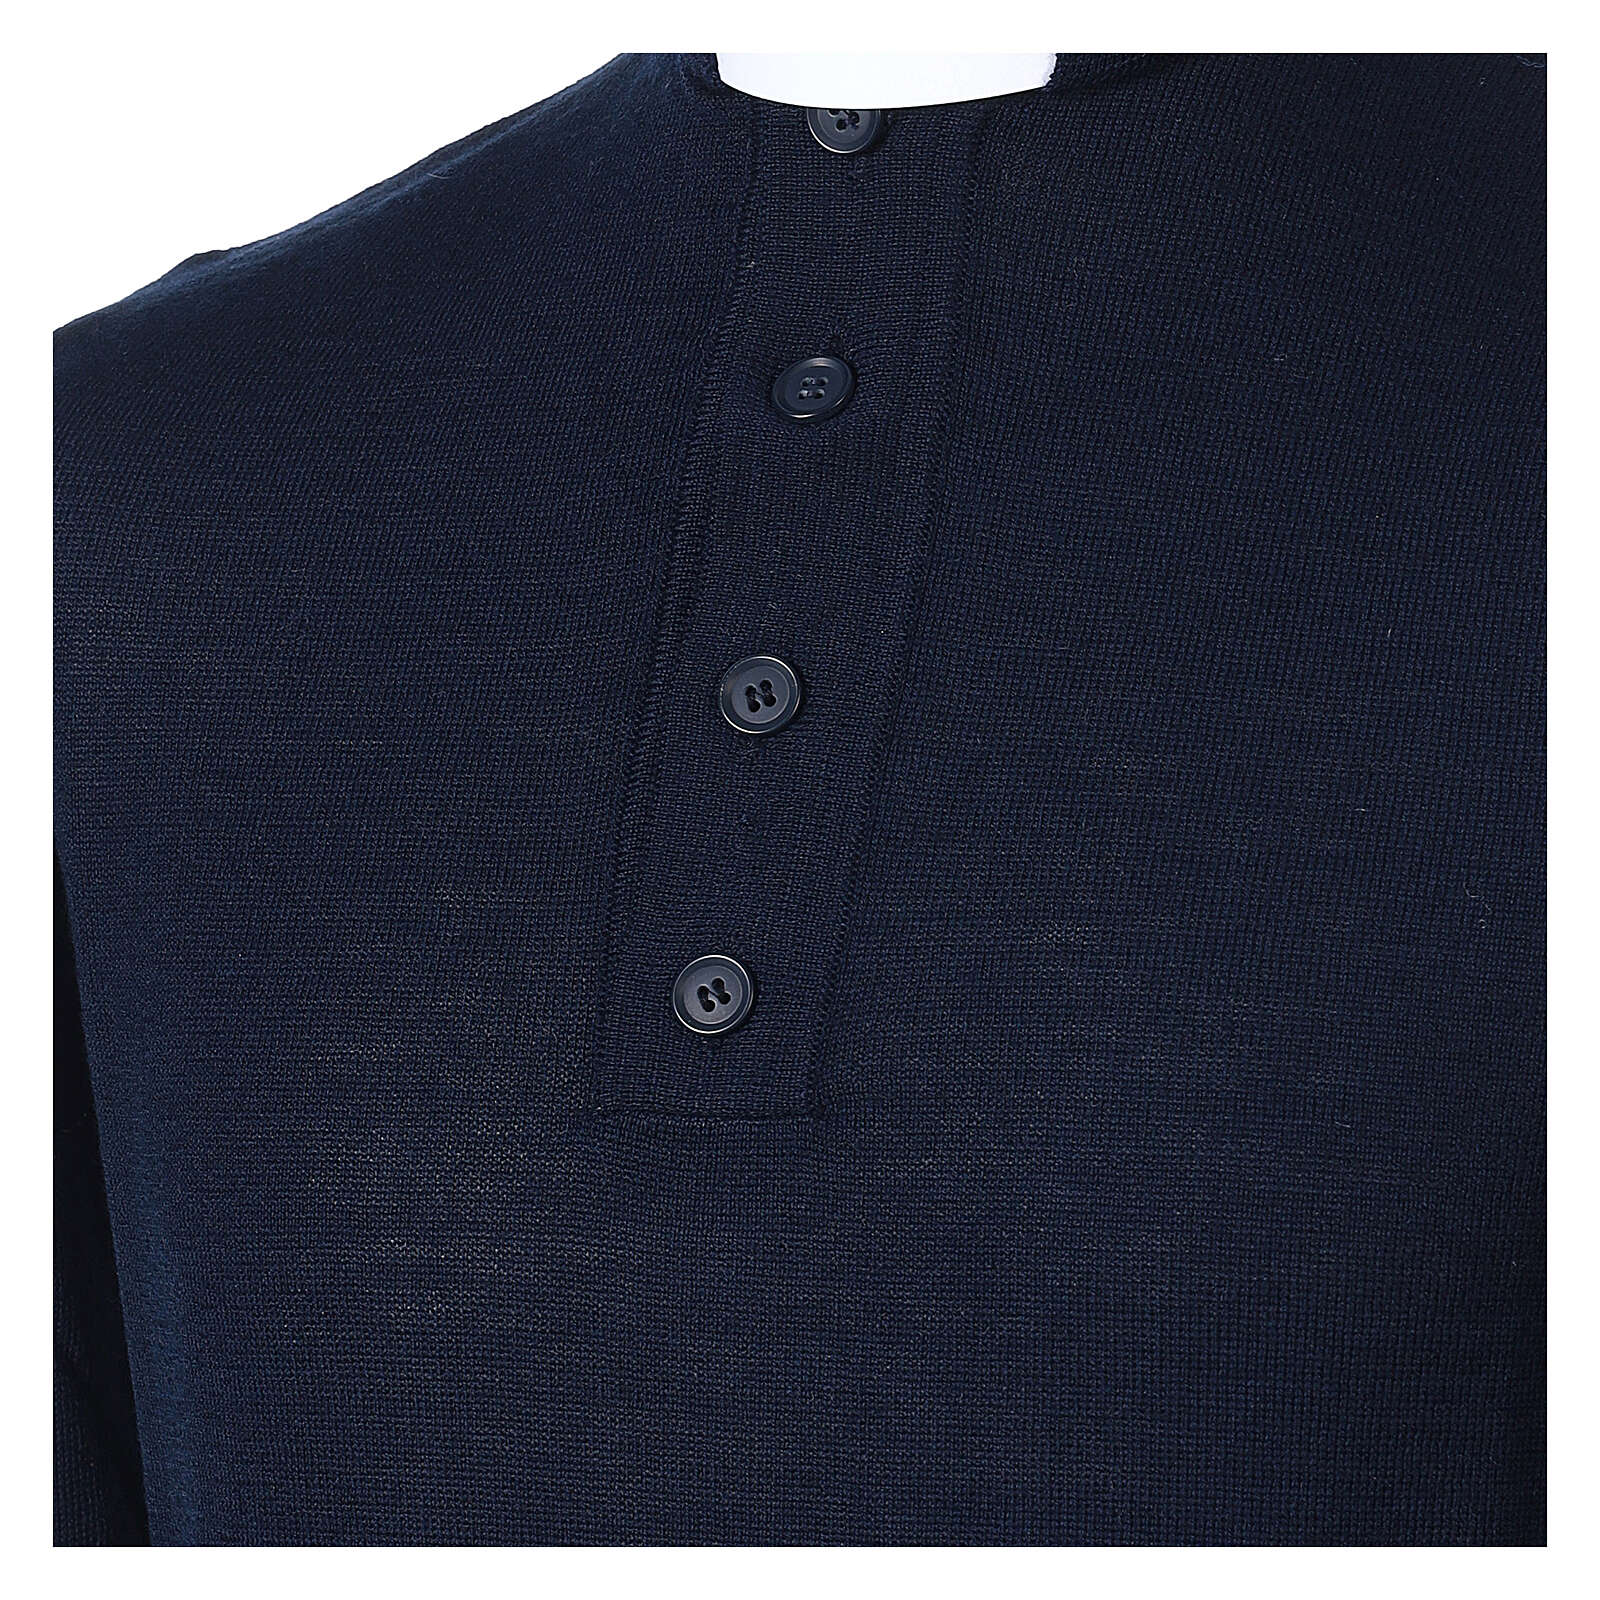 Camiseta Mixto Merino cuello clergy azul 4